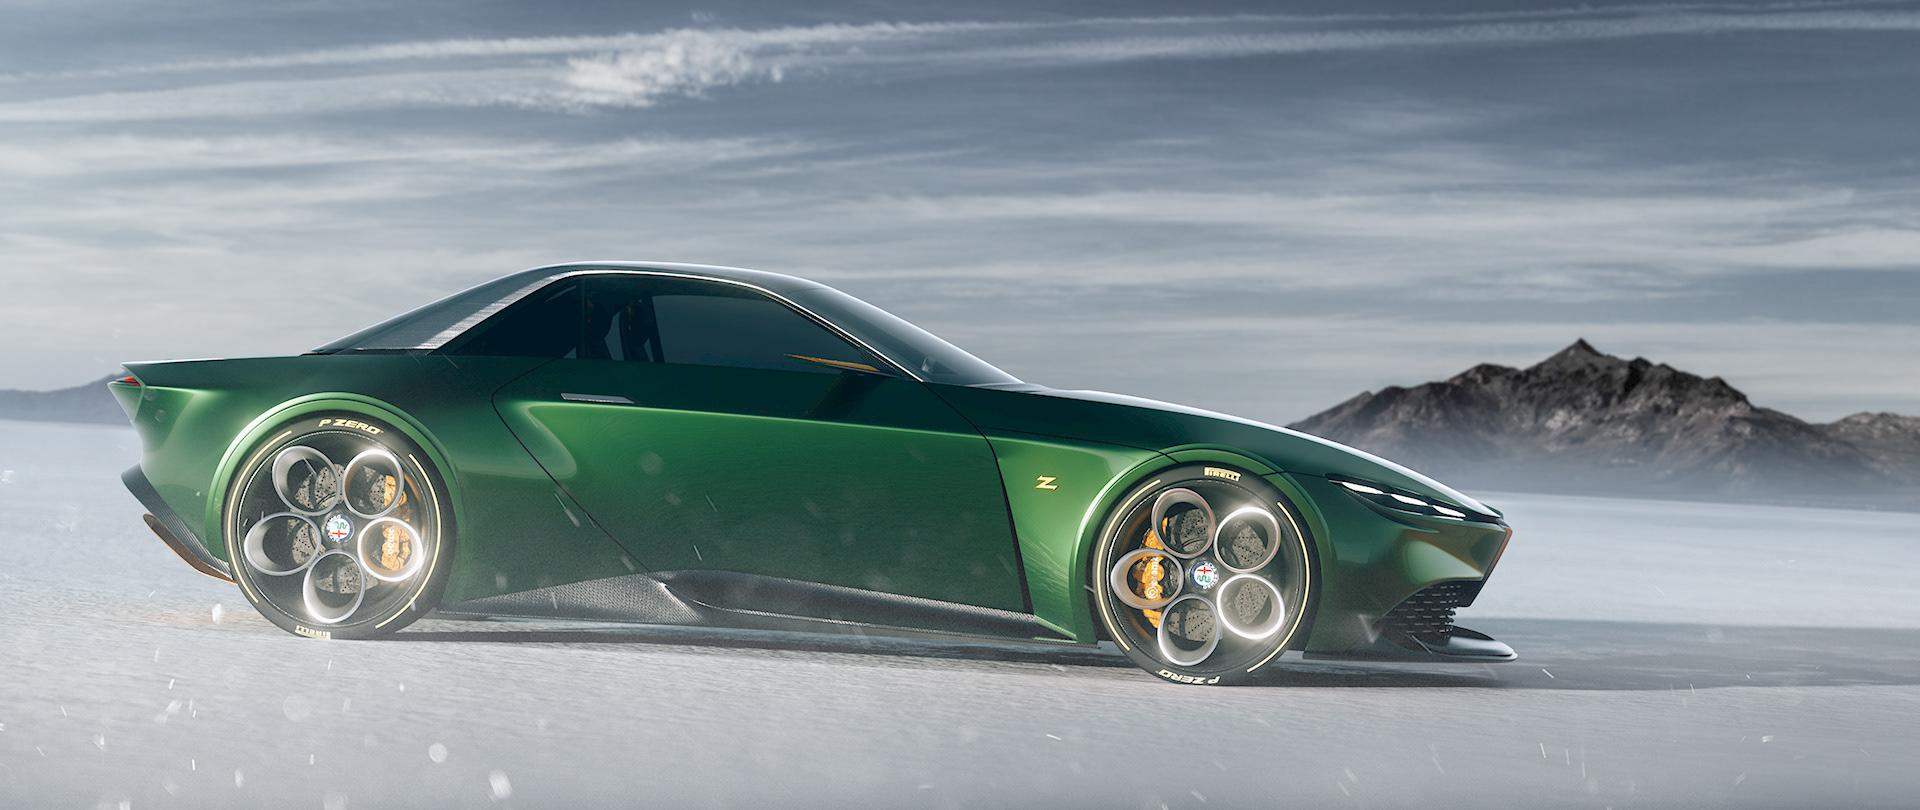 Upoznajte Alfa Romeo Junior Zagato! (GALERIJA)